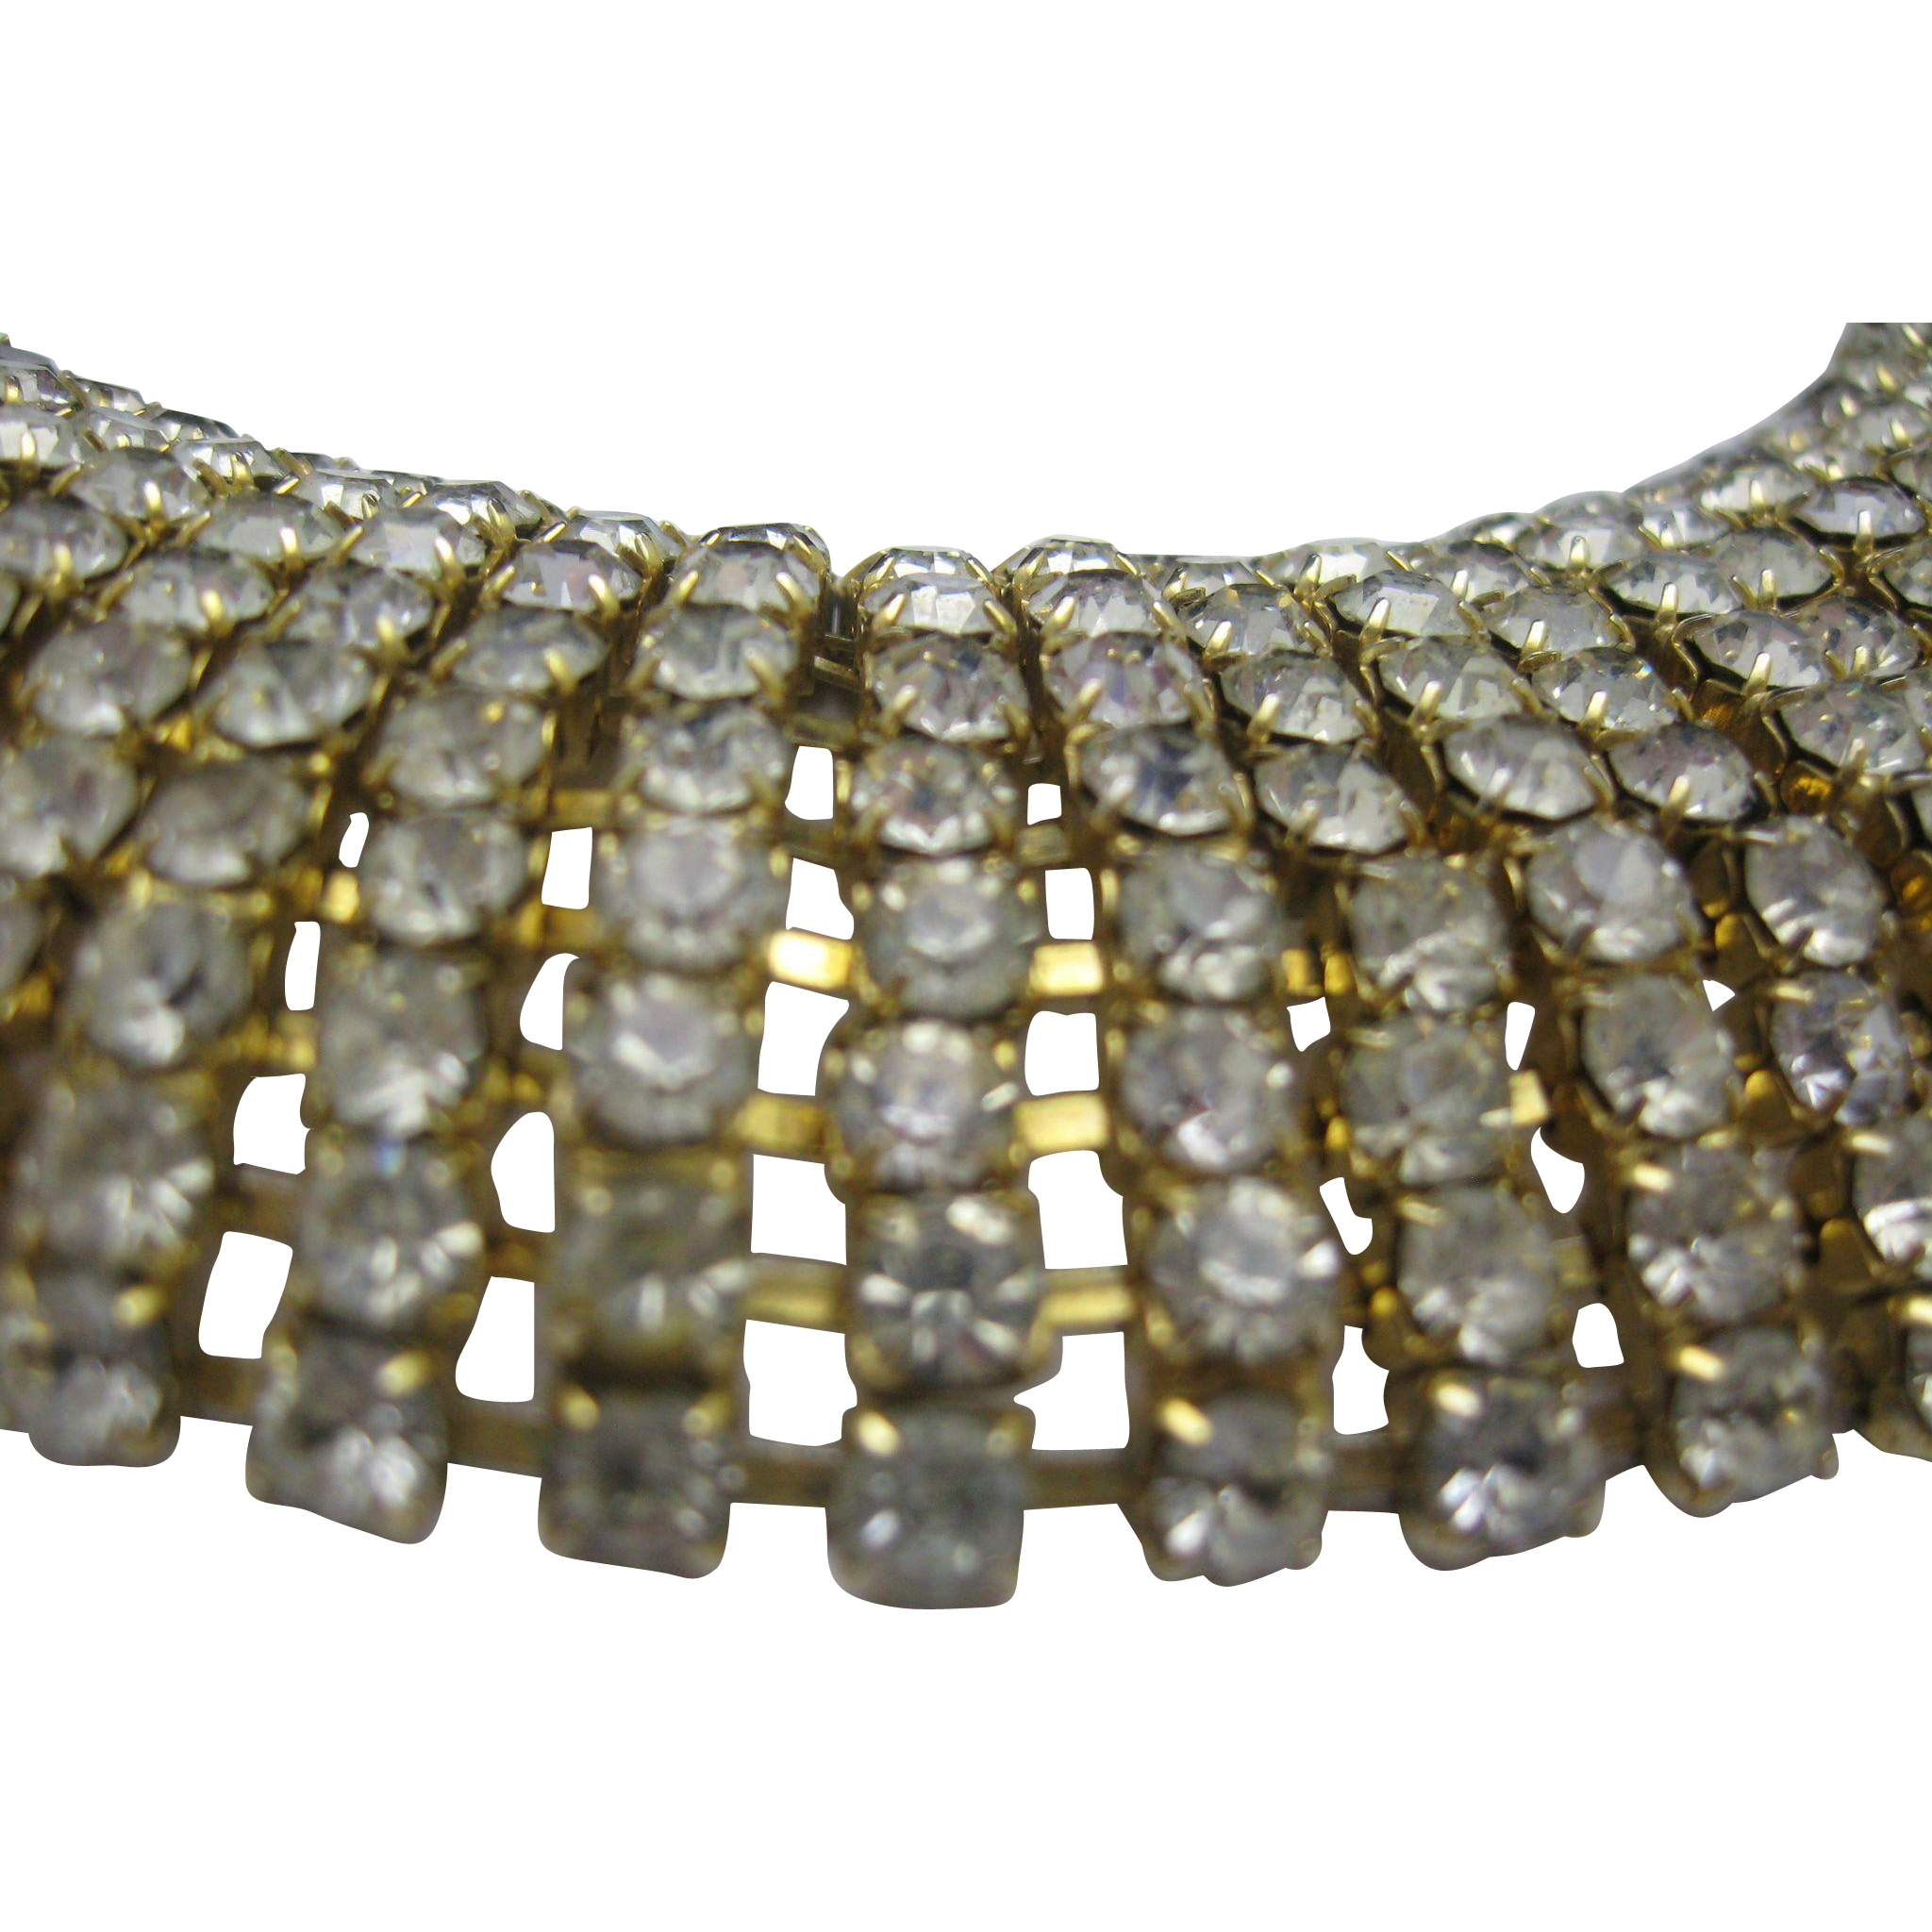 Domed Clear Rhinestone Cocktail Bracelet 1960